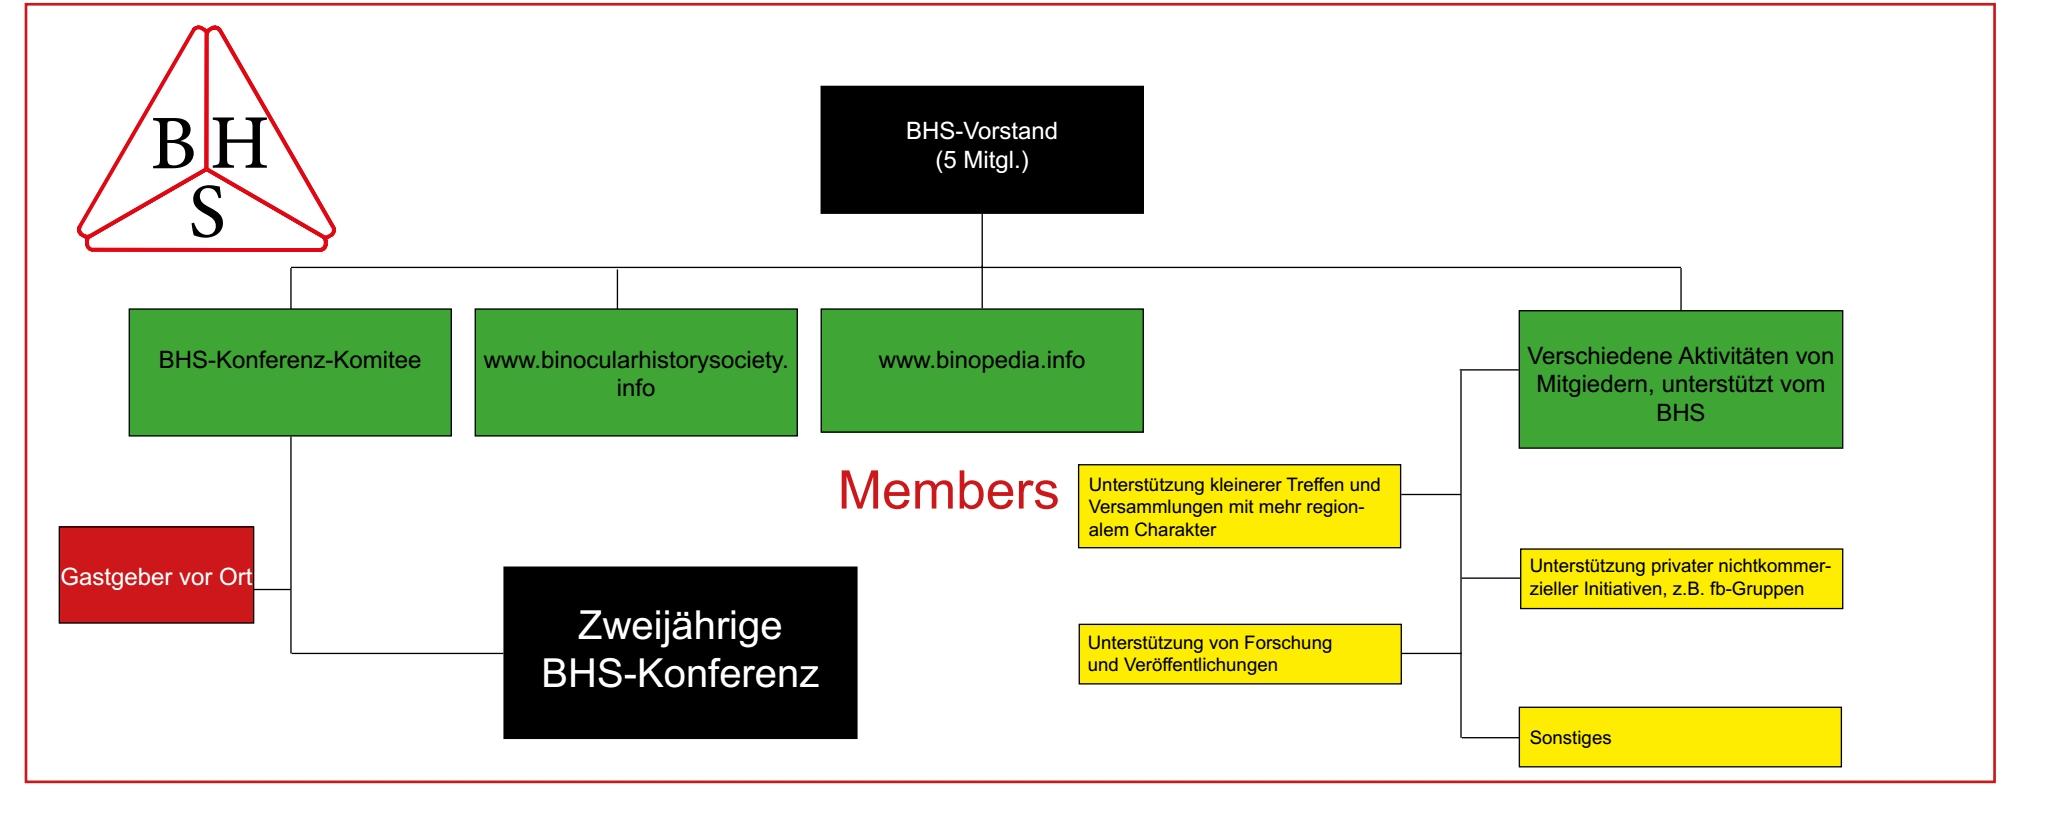 bhs organigramm DE